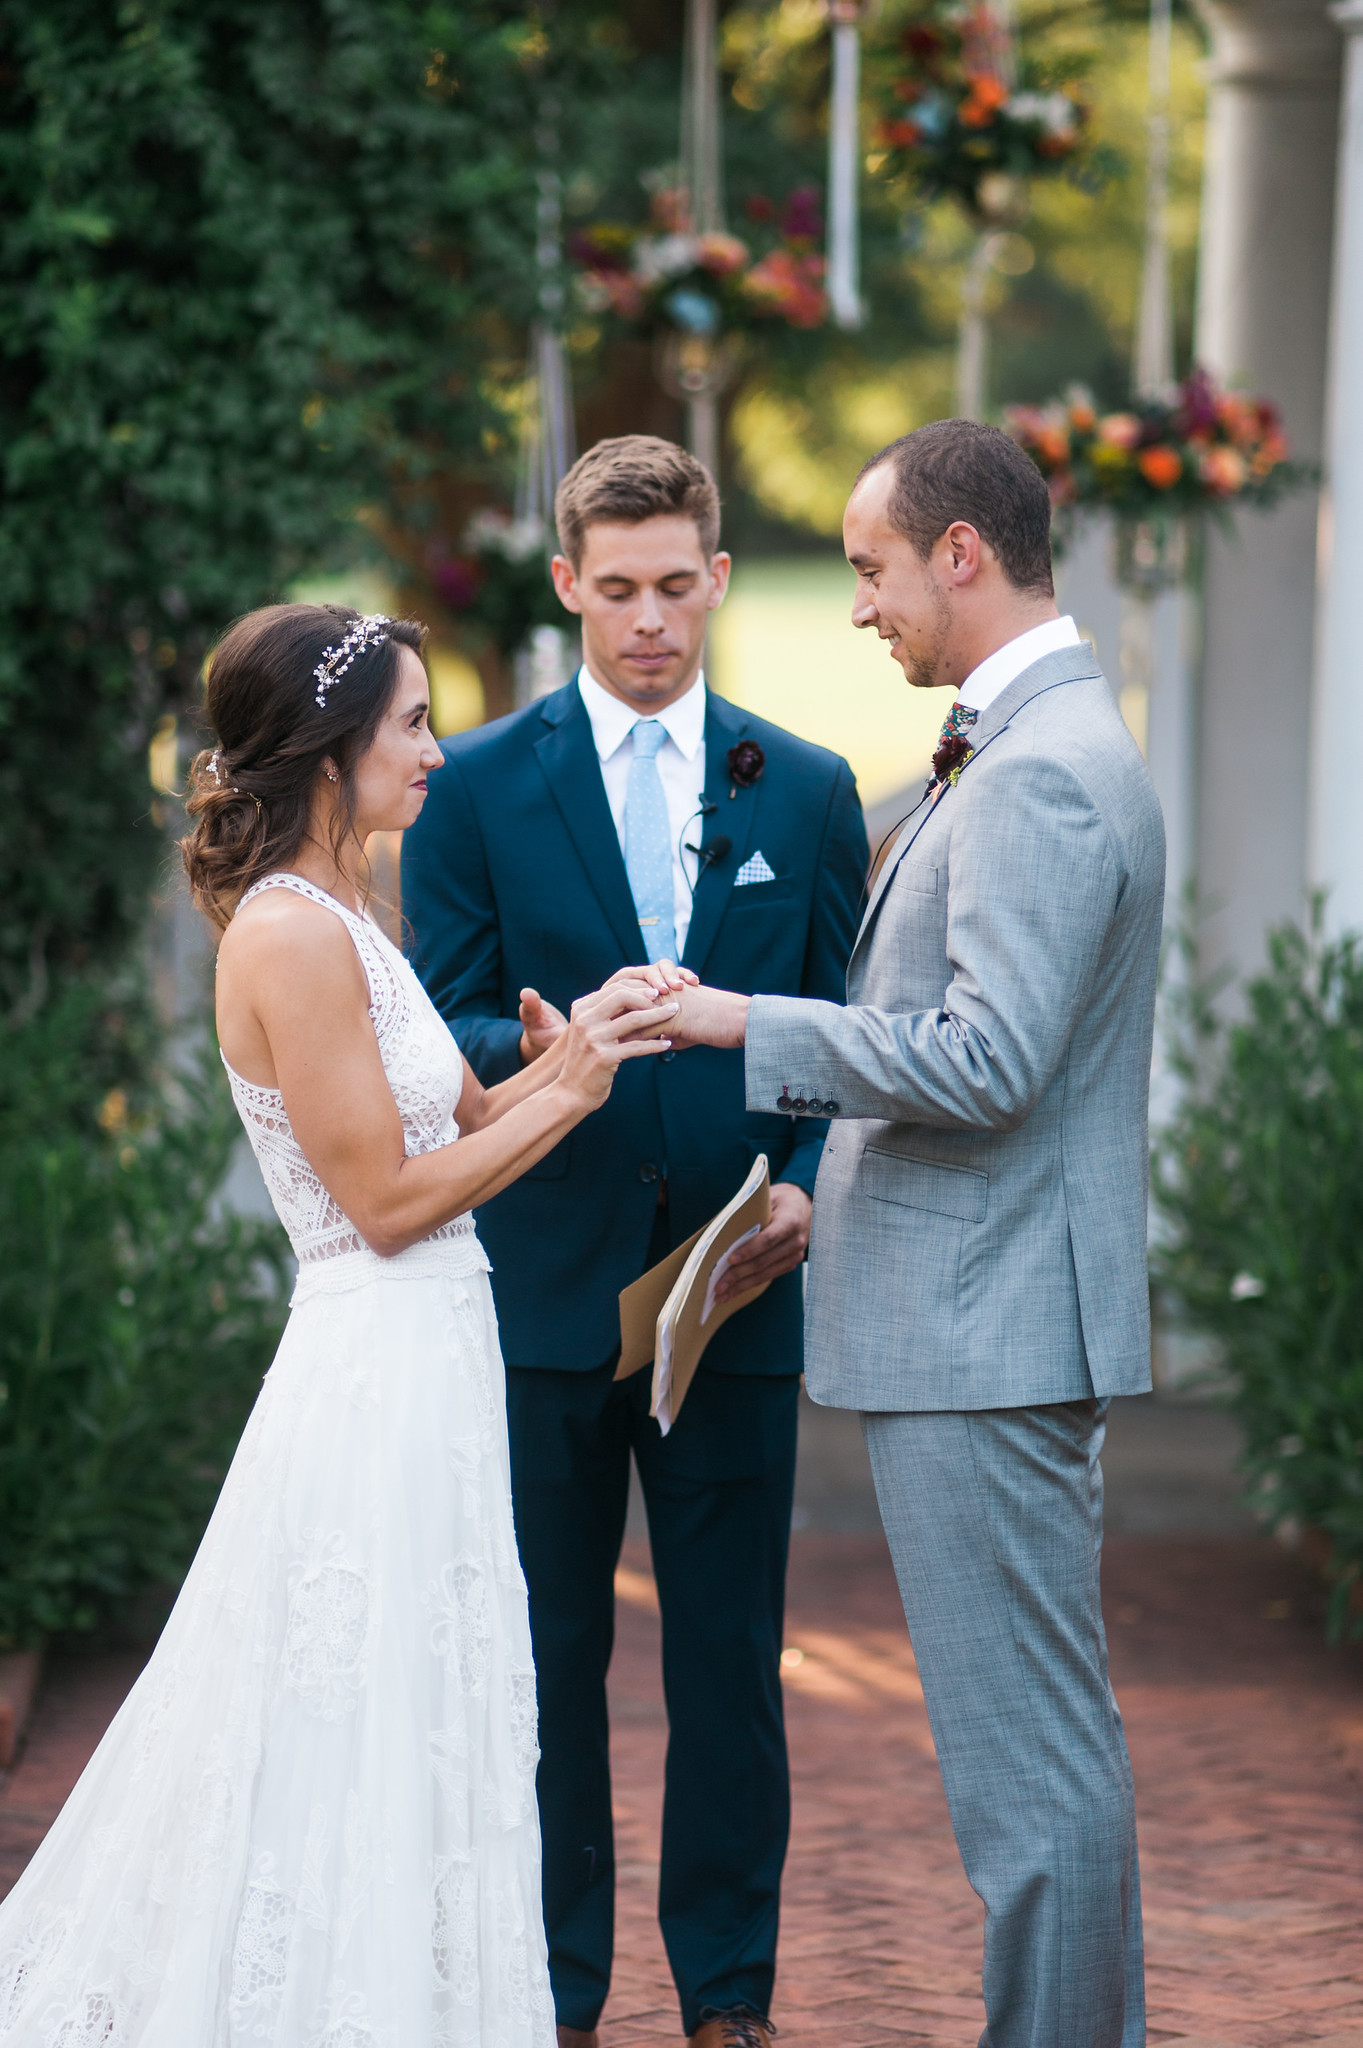 thomas-wedding-228-X4.jpg